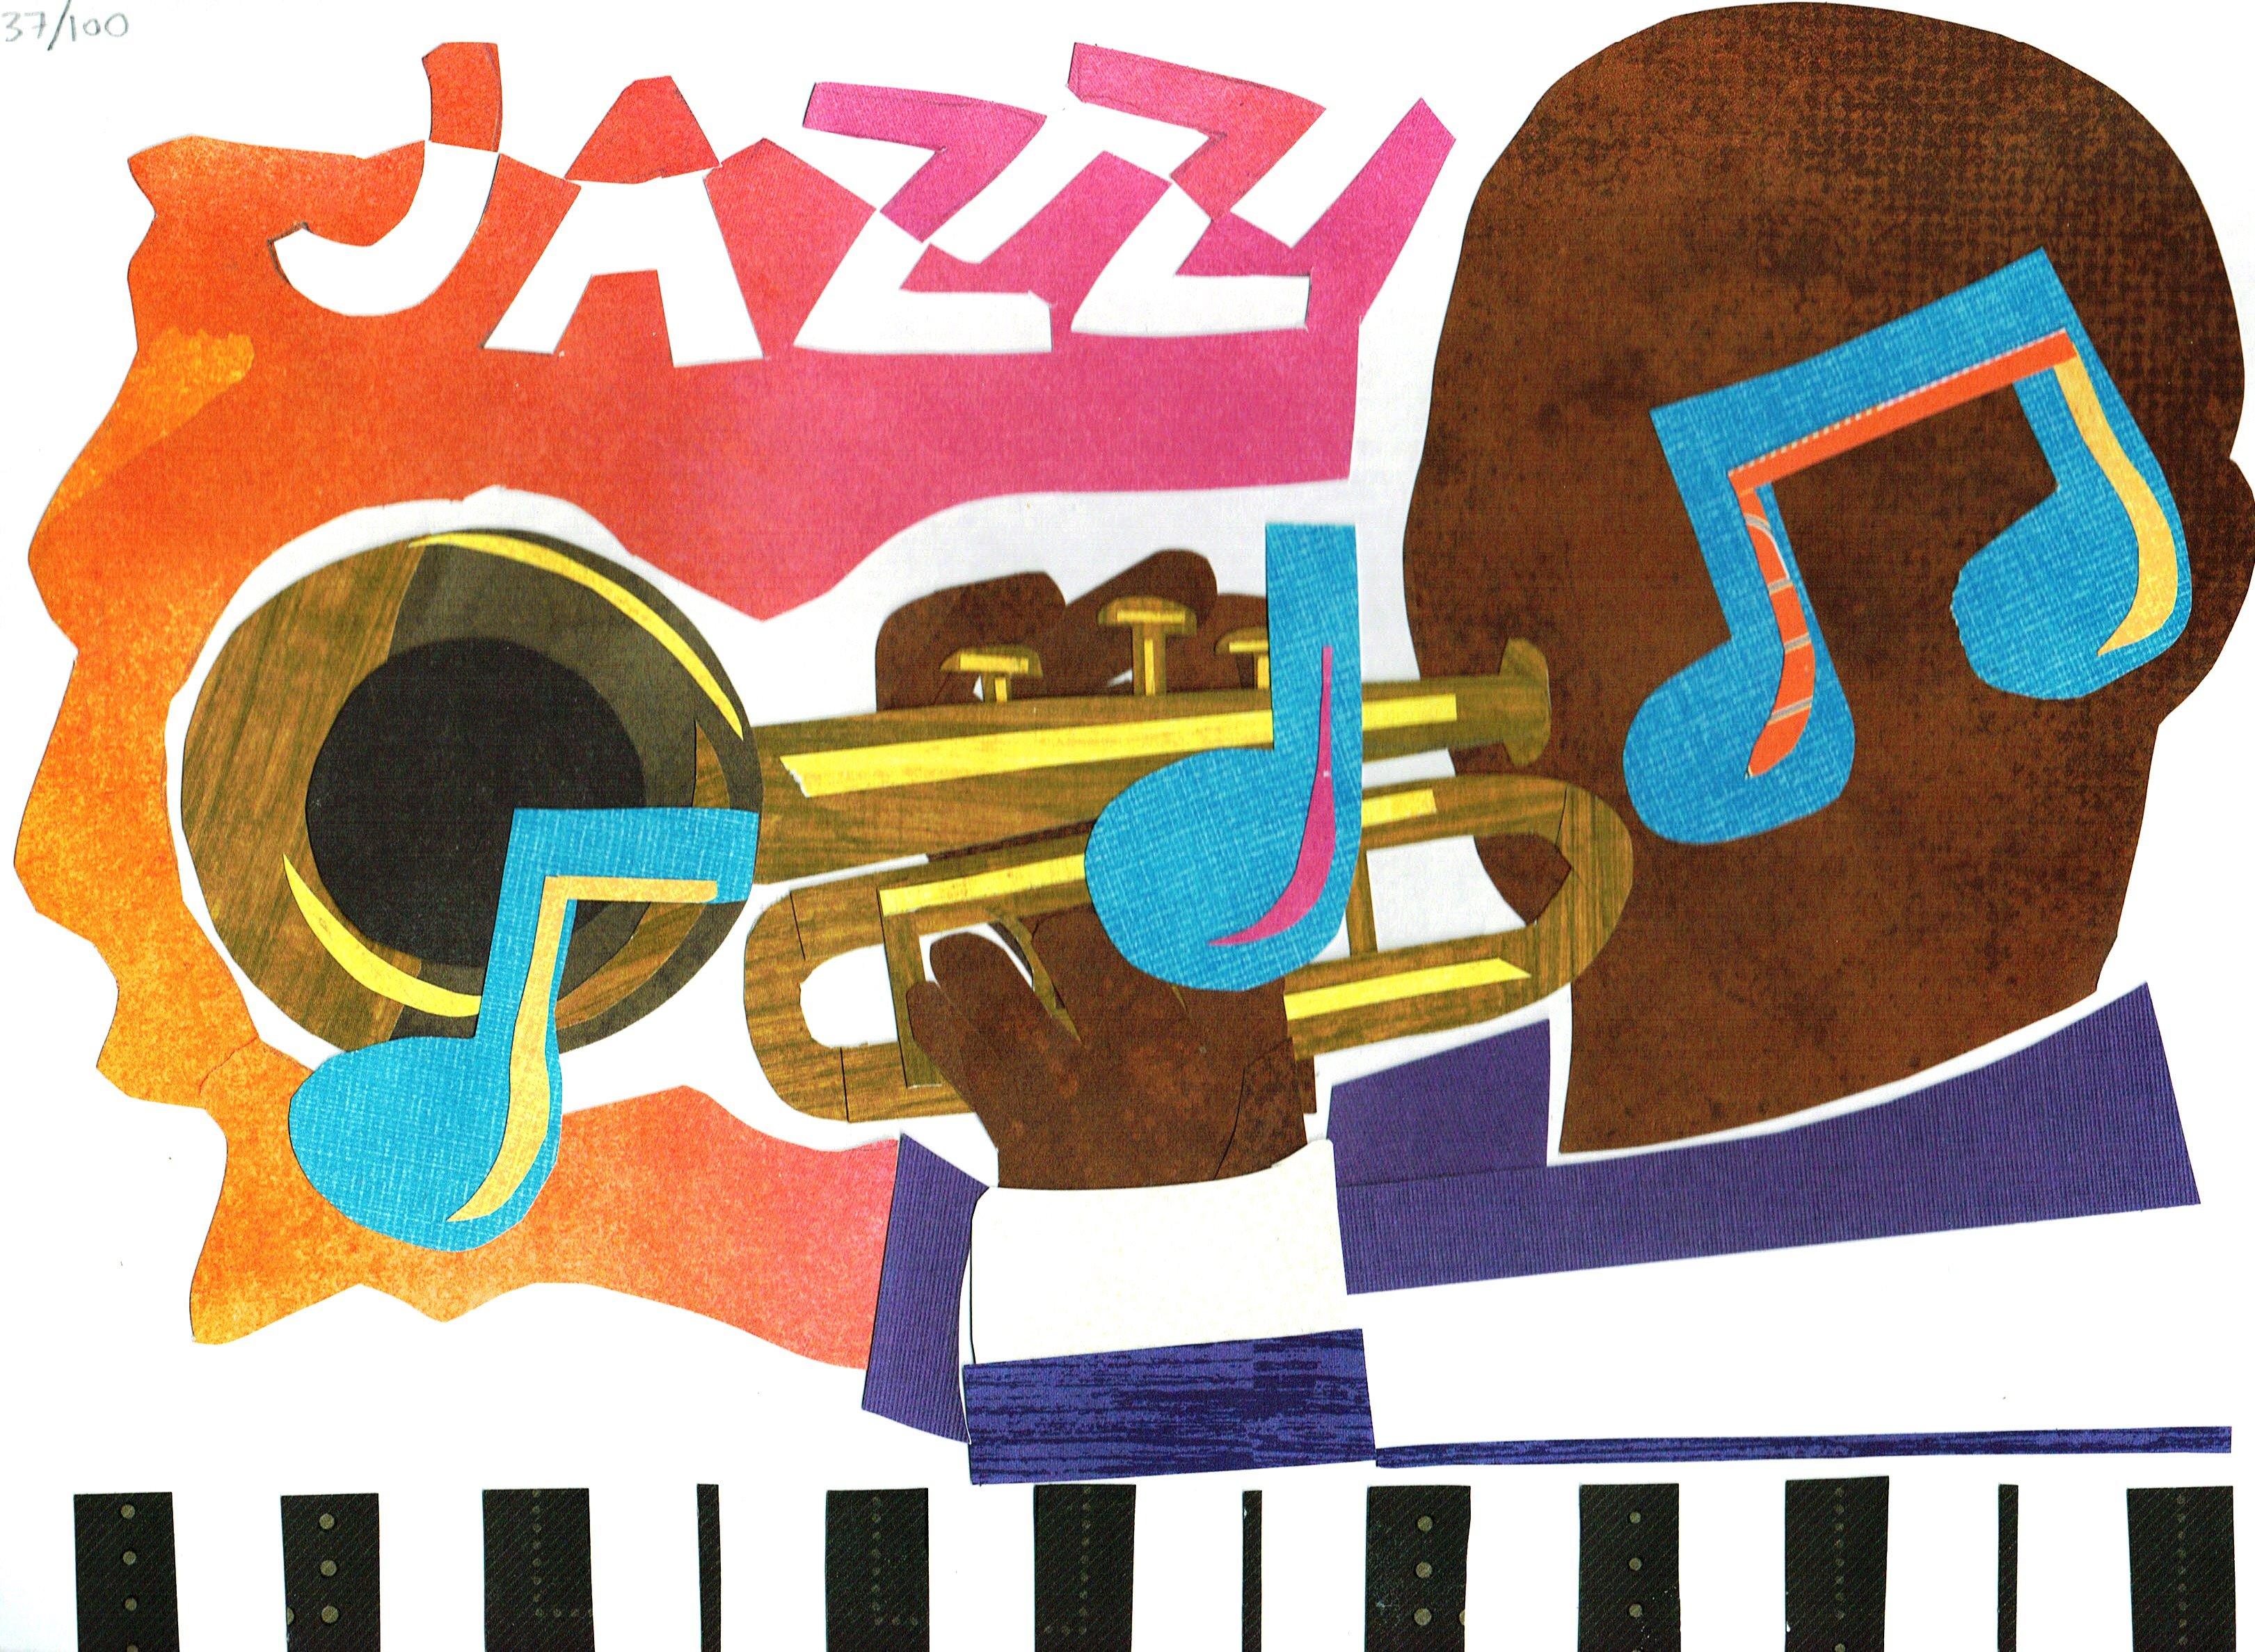 Day 37 - Jazz